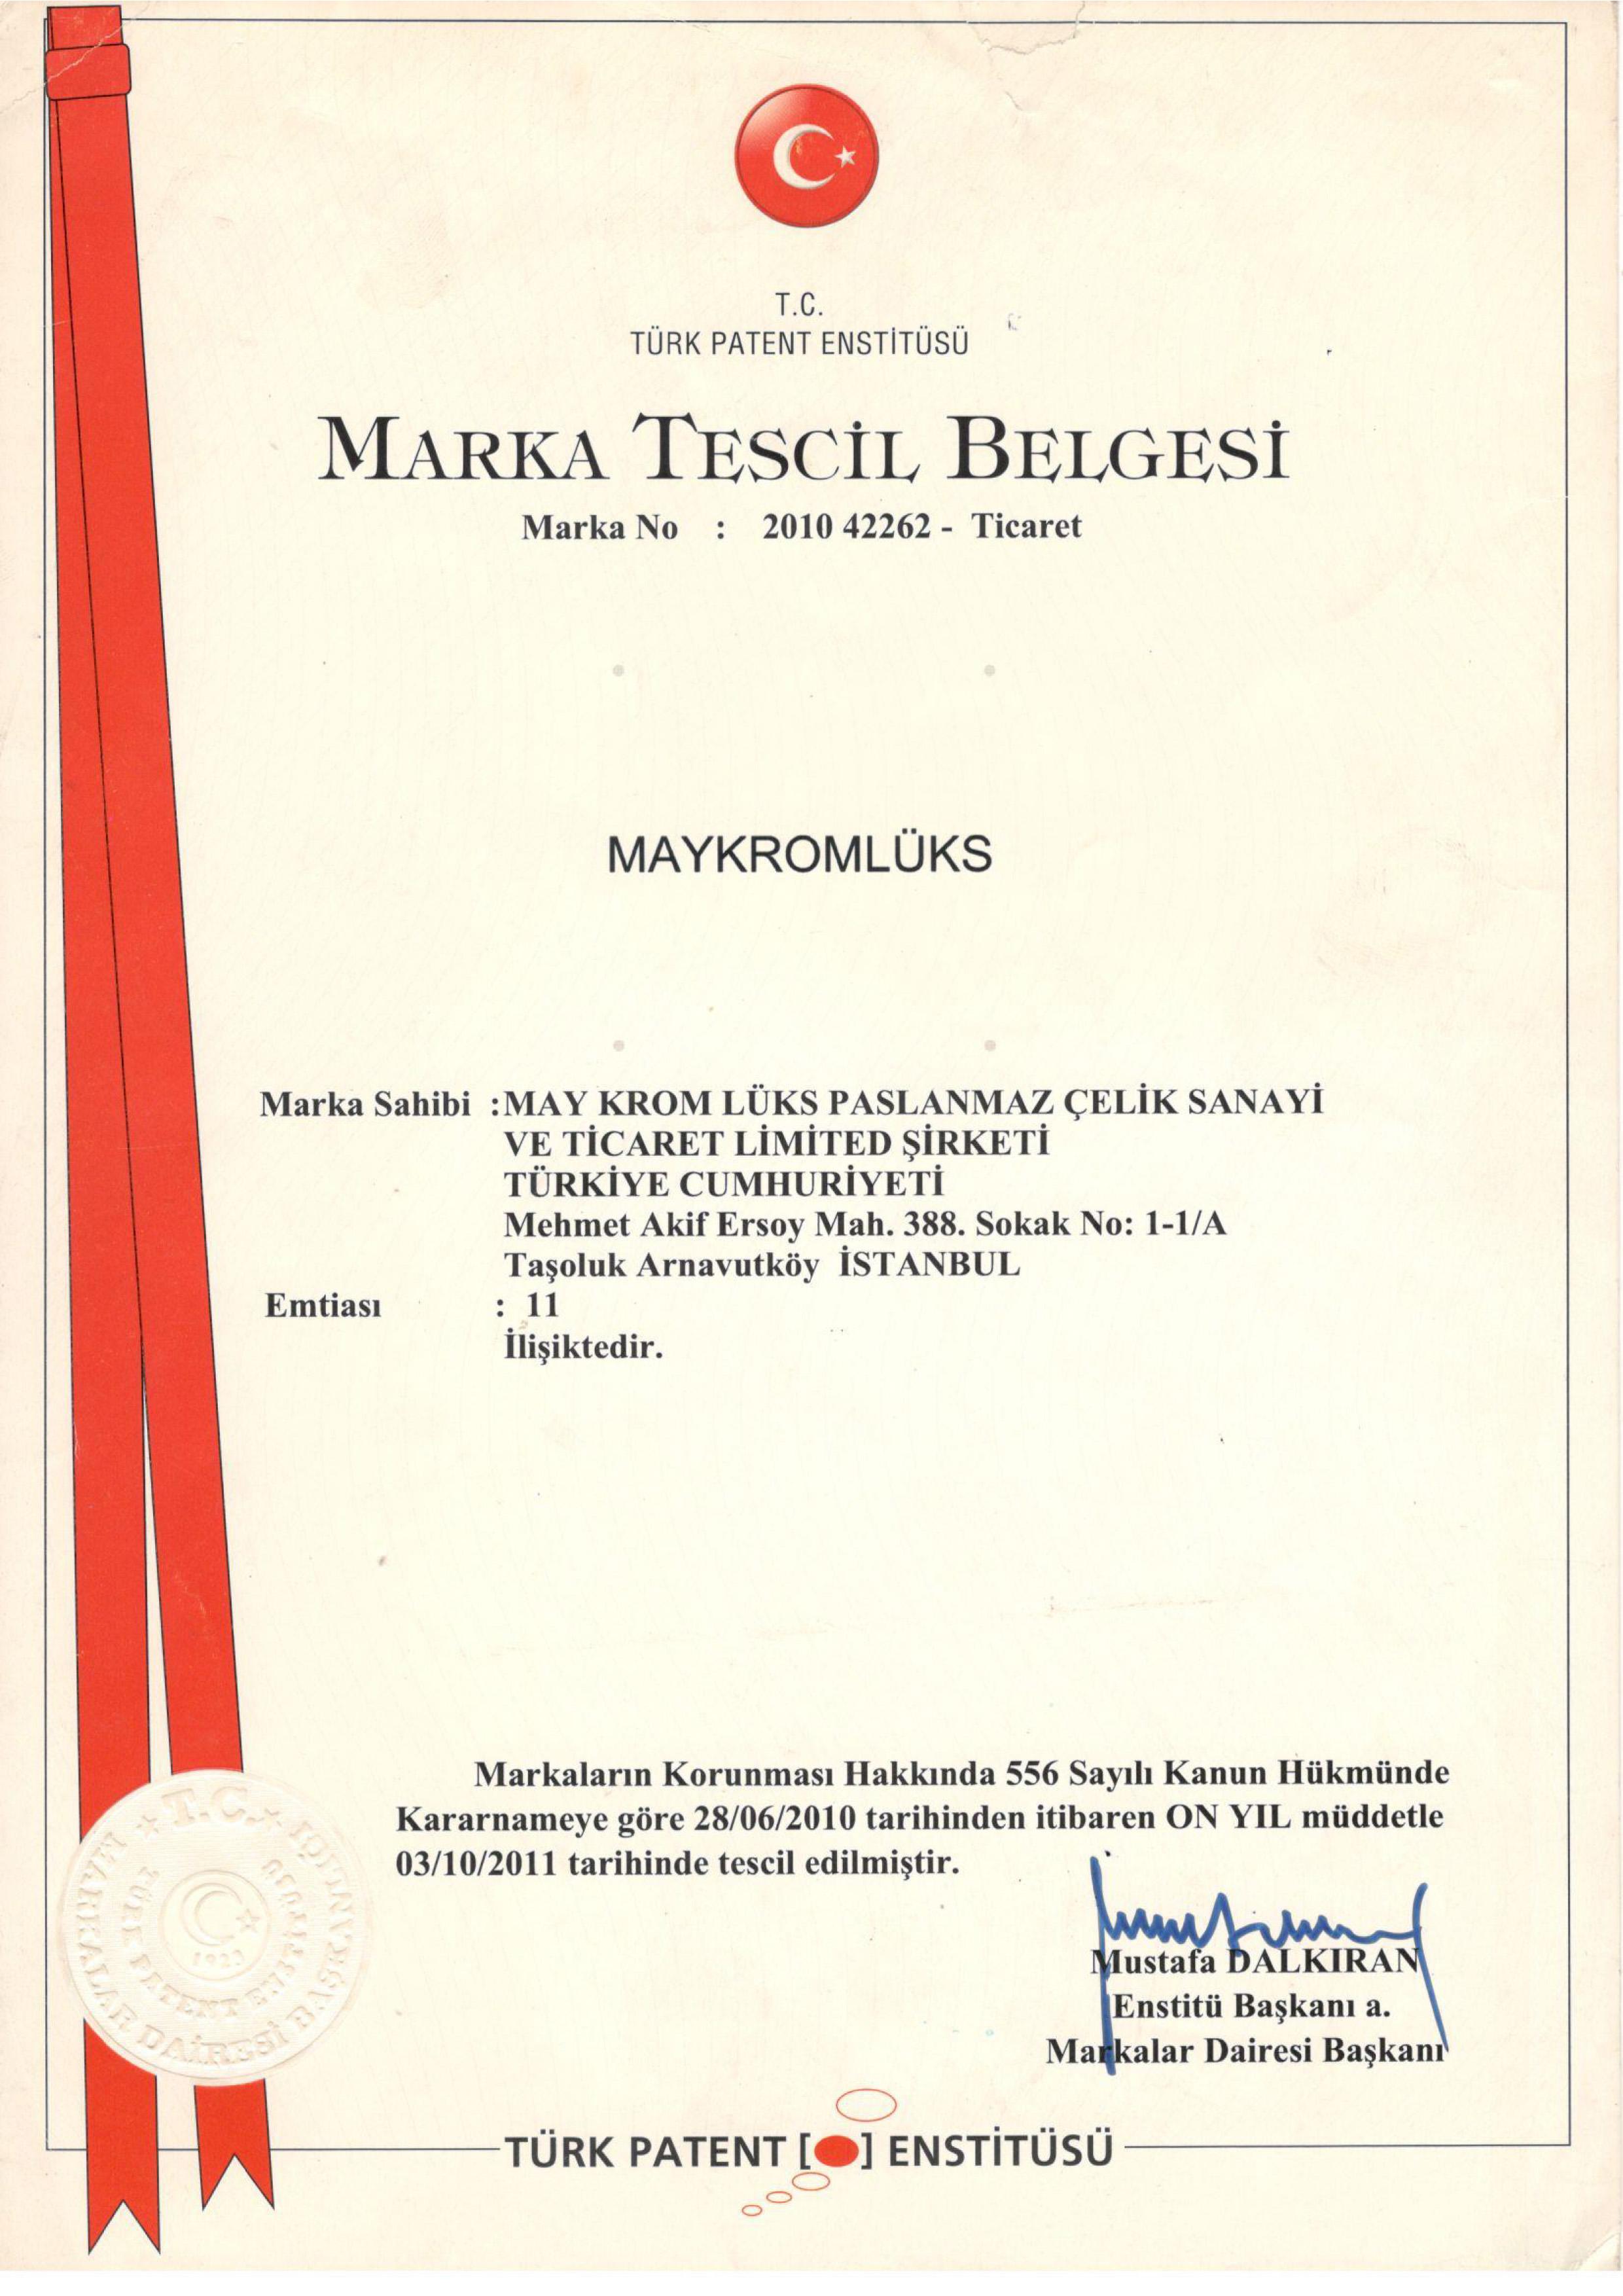 MARKA TESCIL BELGESI2 - CERTIFICATES